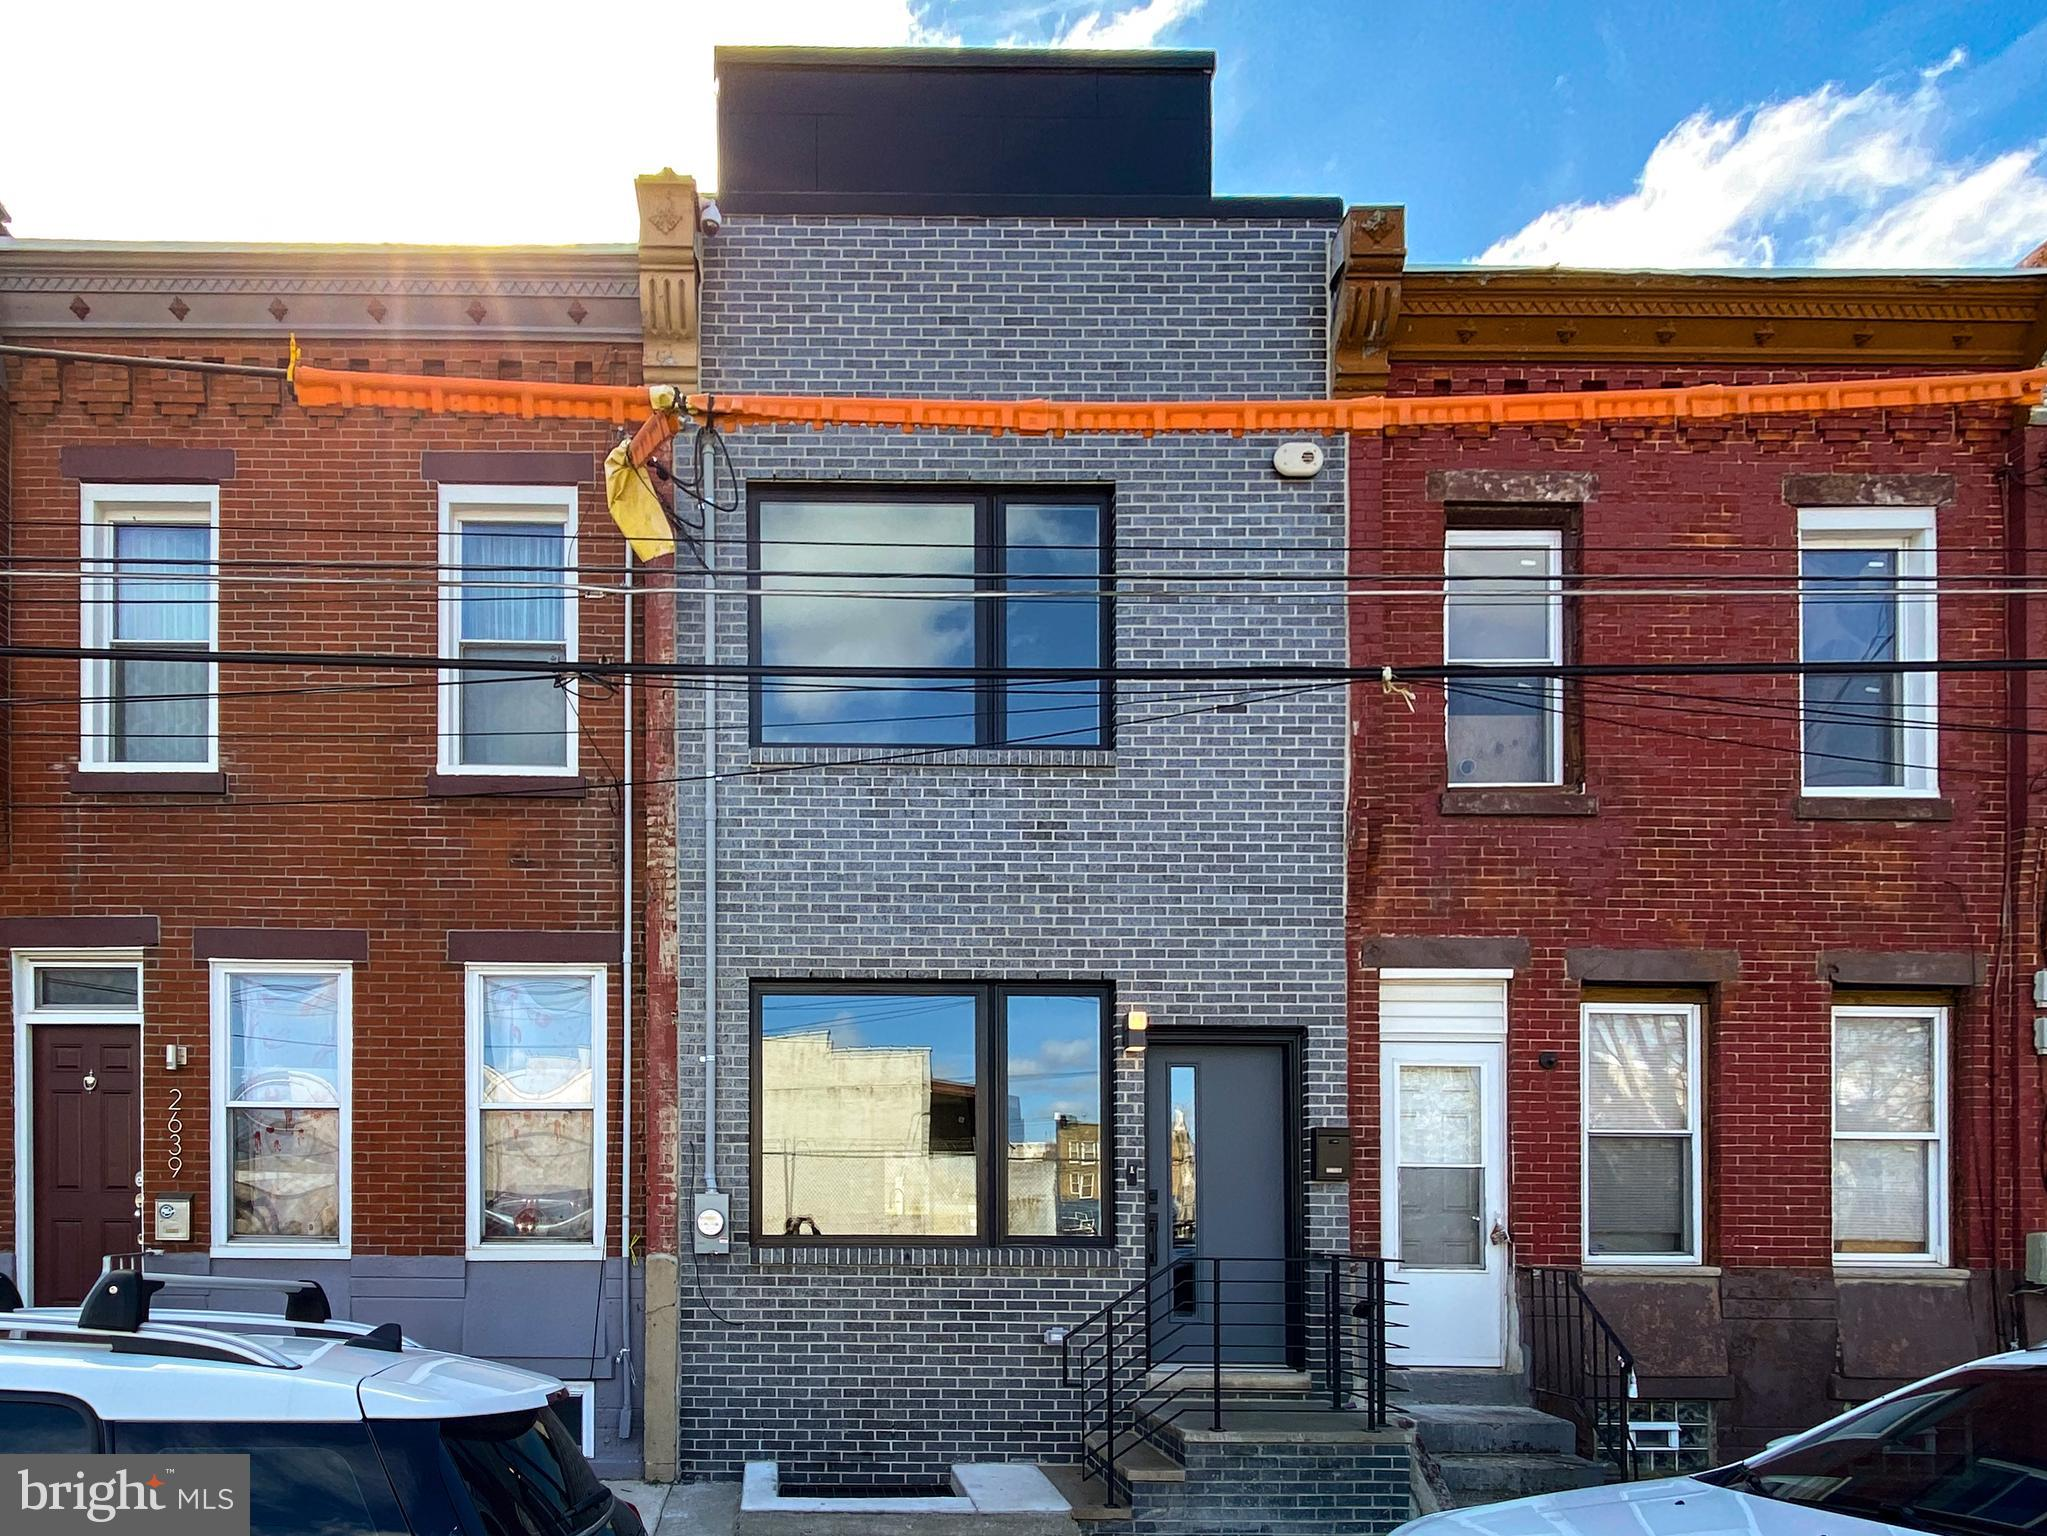 2637 Amber Street, Philadelphia, PA 19125